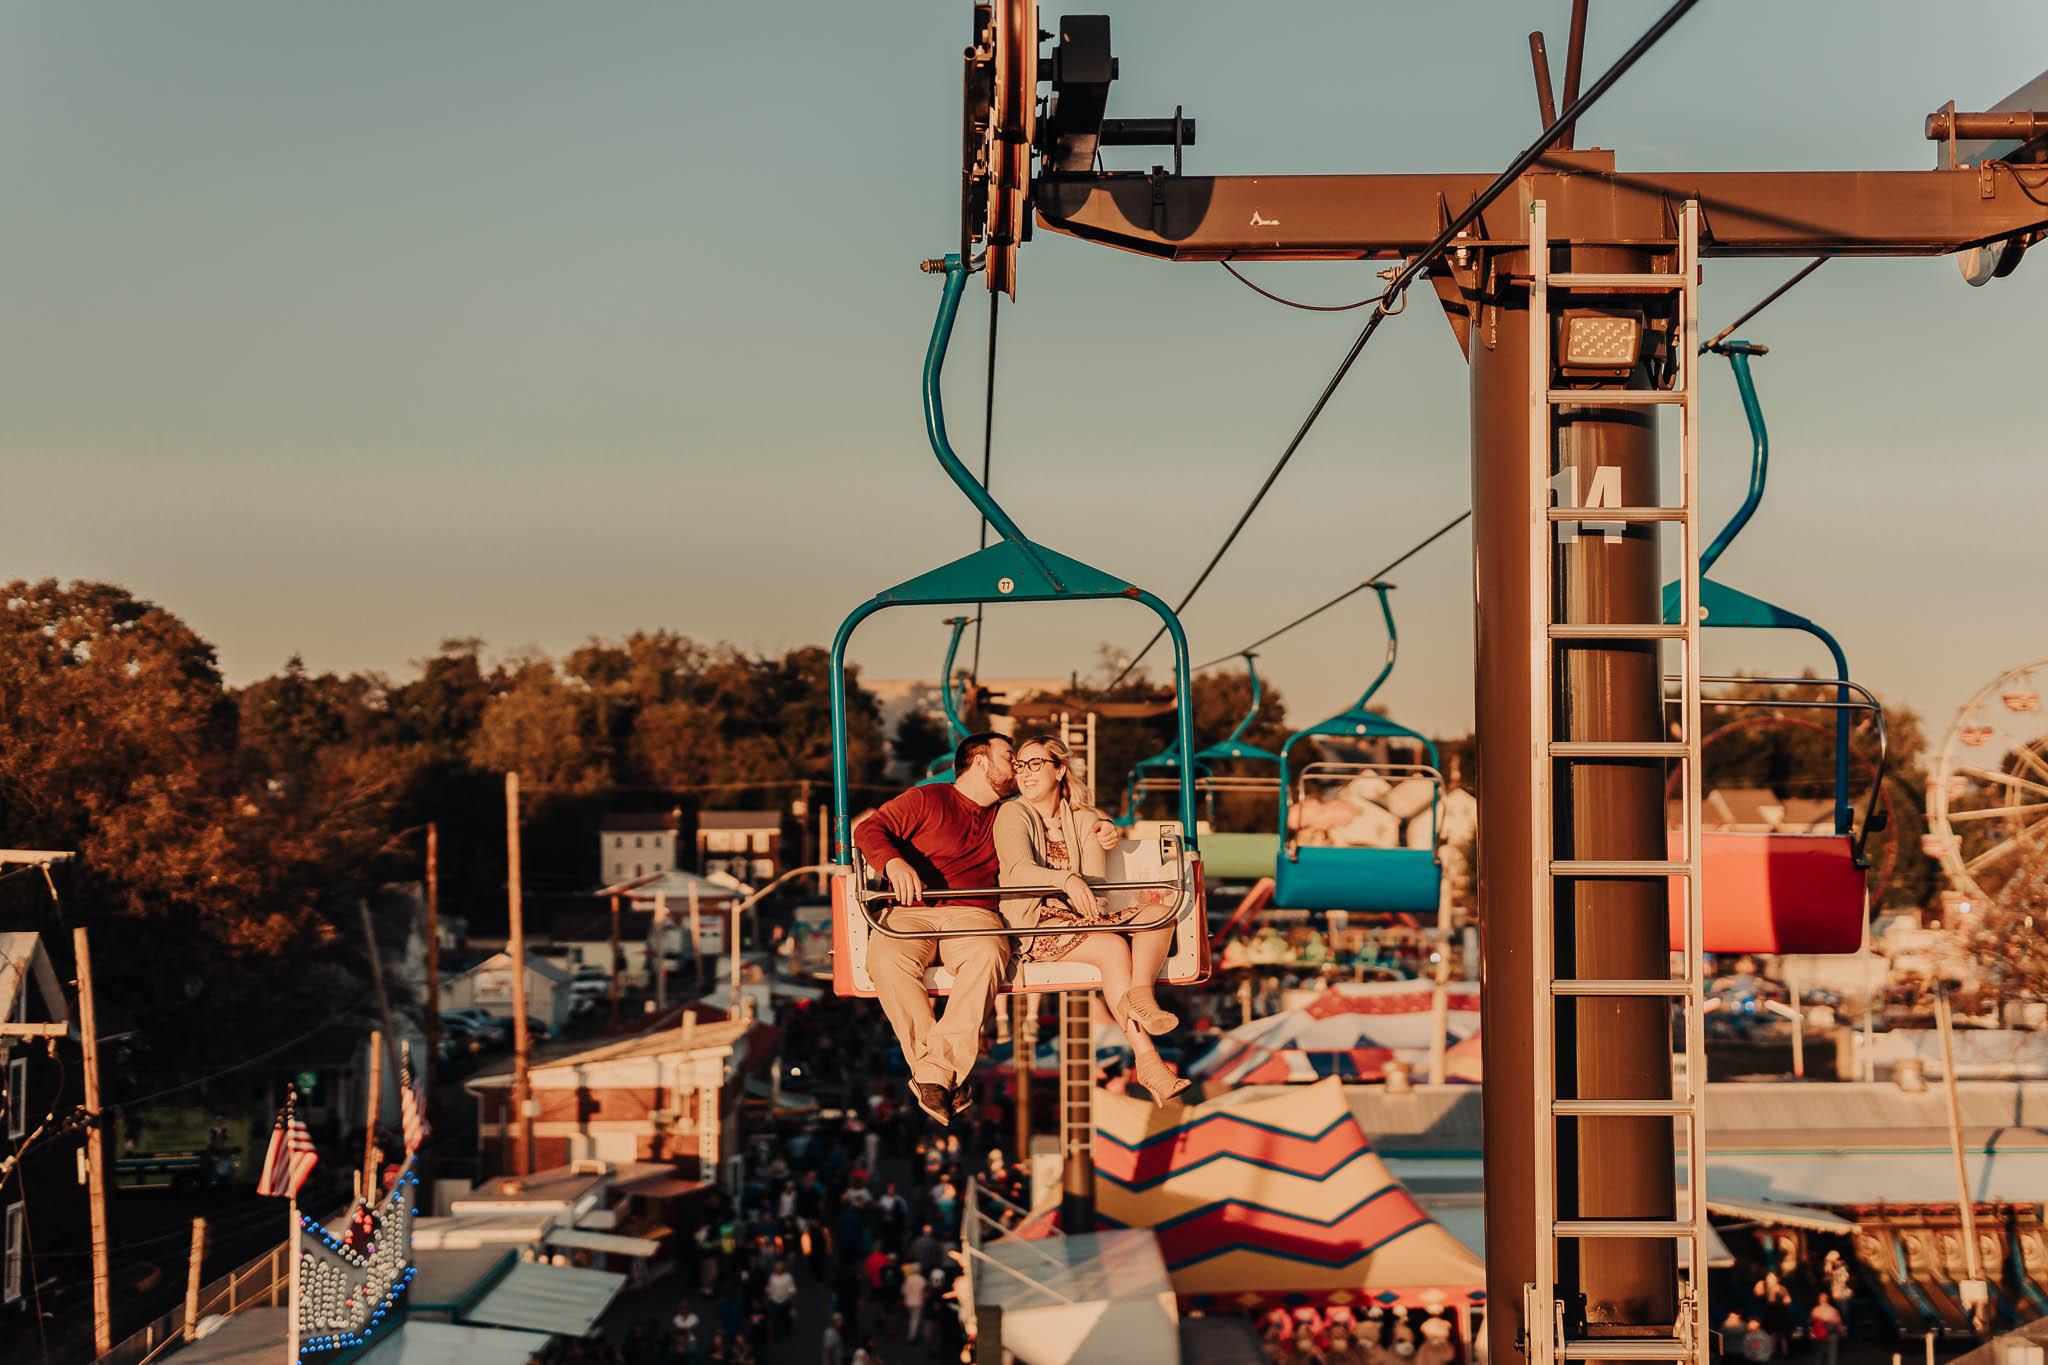 bloomsburg-fair-engagement-5405.jpg